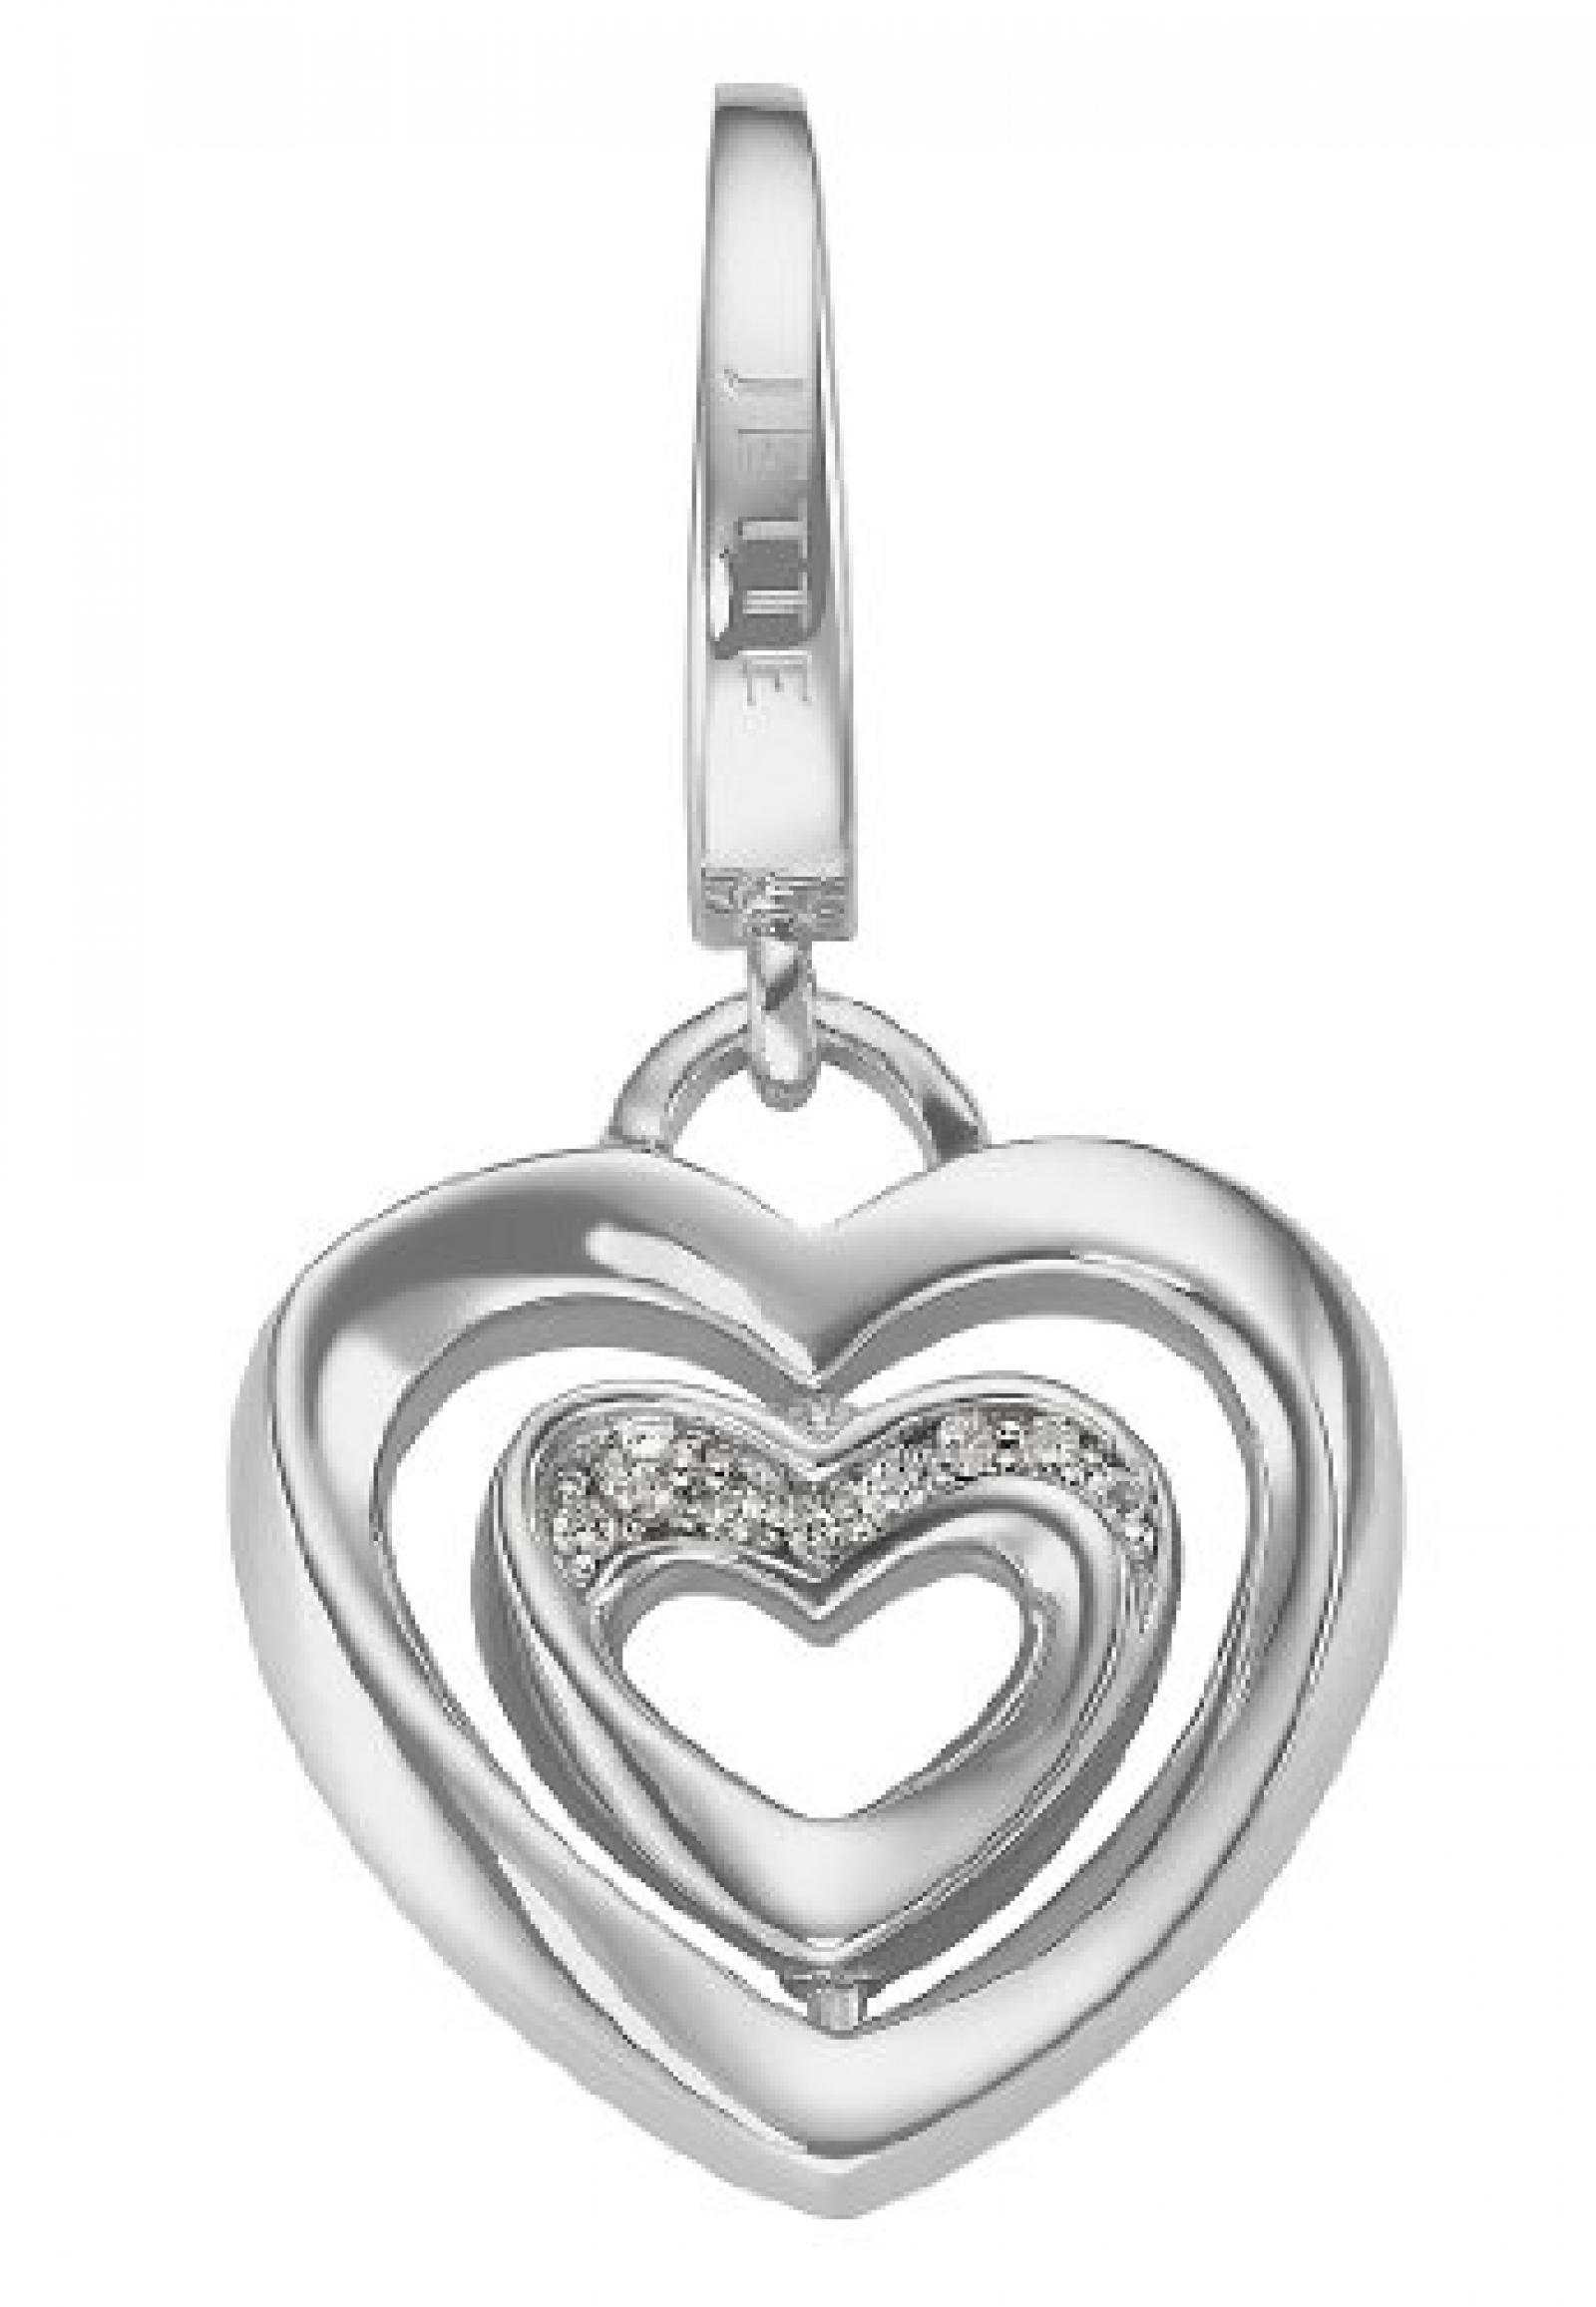 JETTE Charms Damen-Charm CHARM 925er Silber rhodiniert 8 Zirkonia One Size, silber